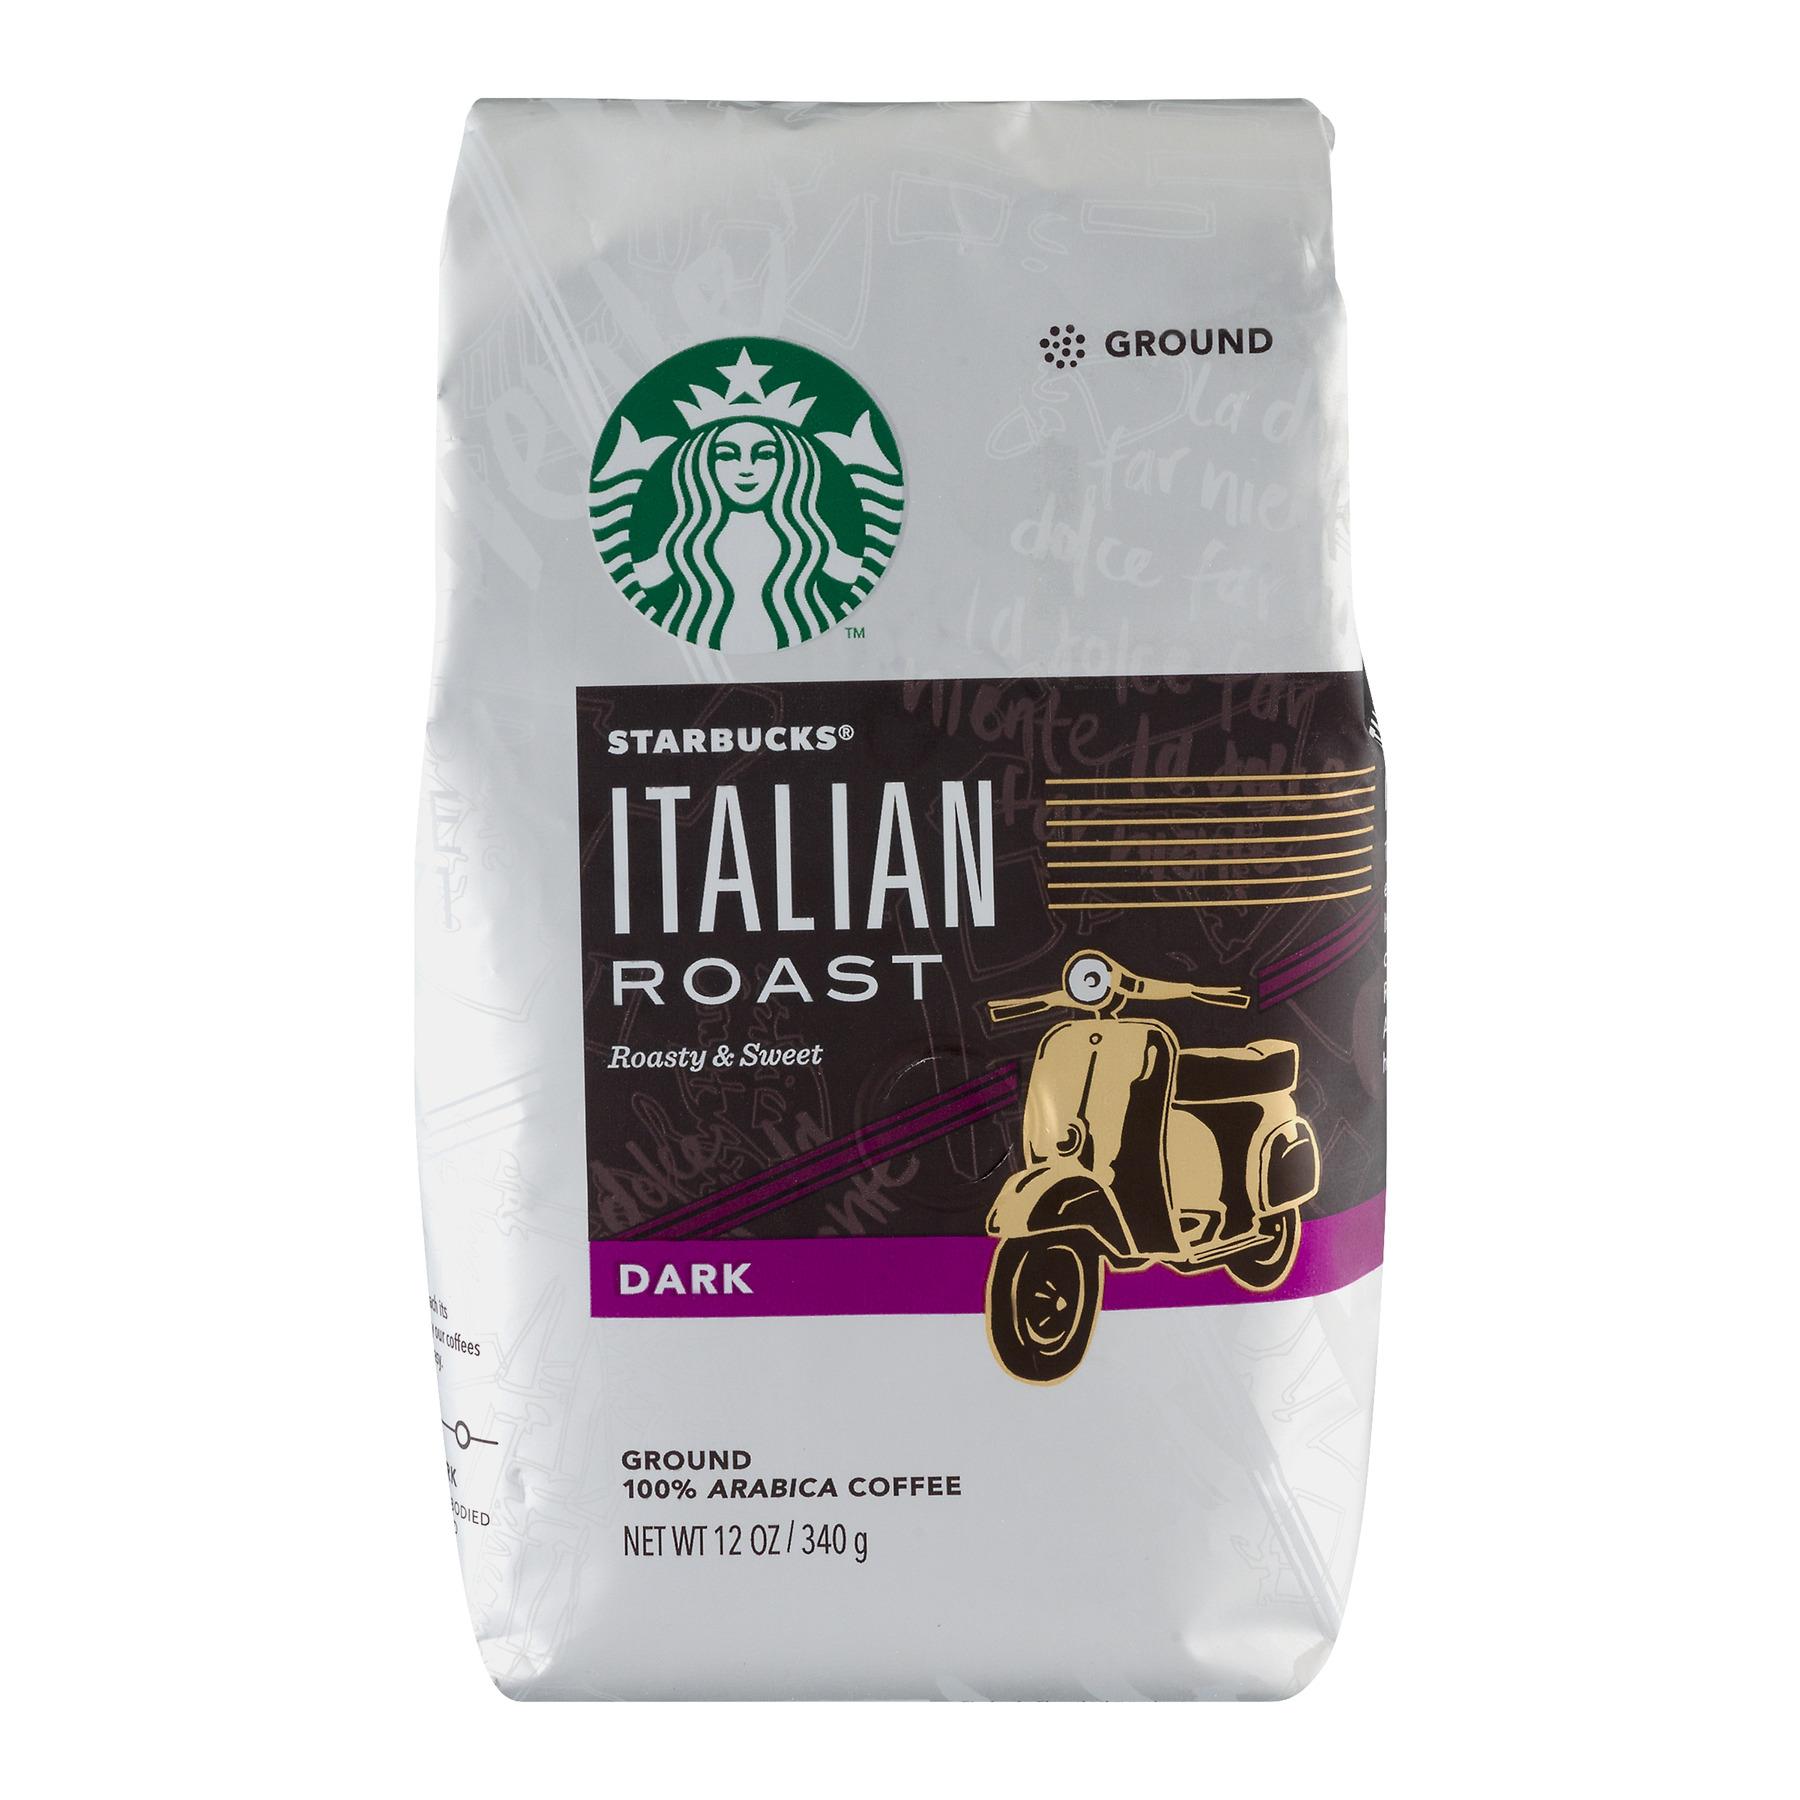 Starbucks Italian Roast Dark Ground Coffee, 12.0 OZ